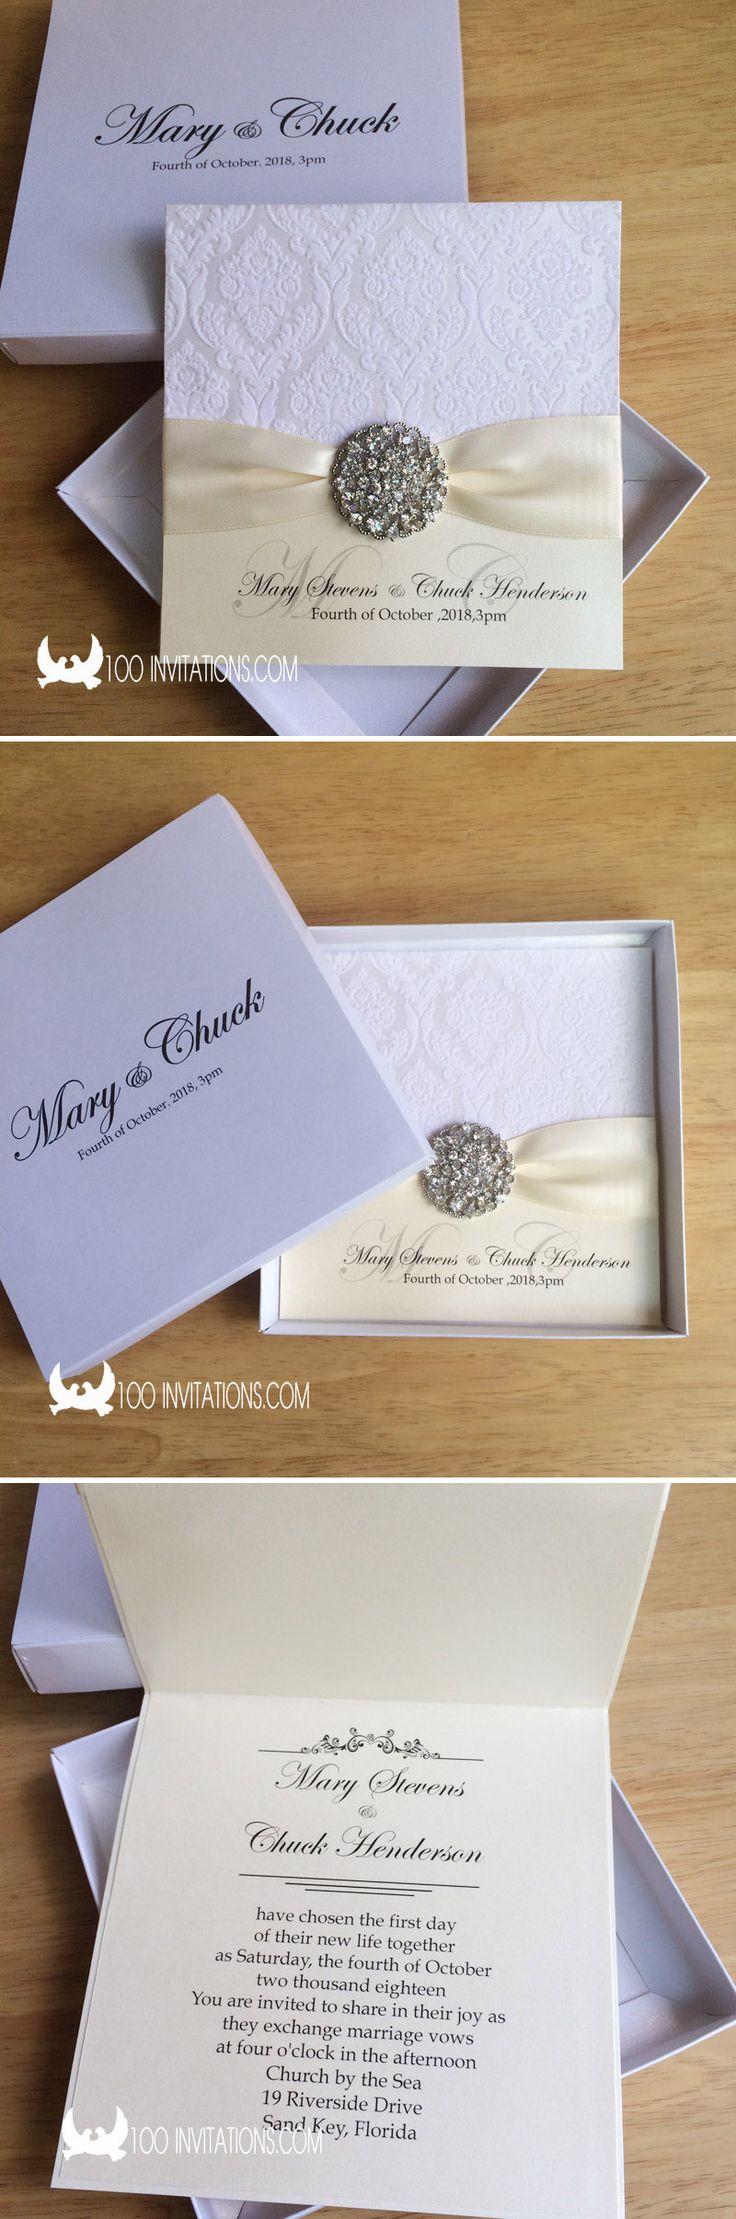 16 Best Convites De Casamento Images On Pinterest Invitation Cards